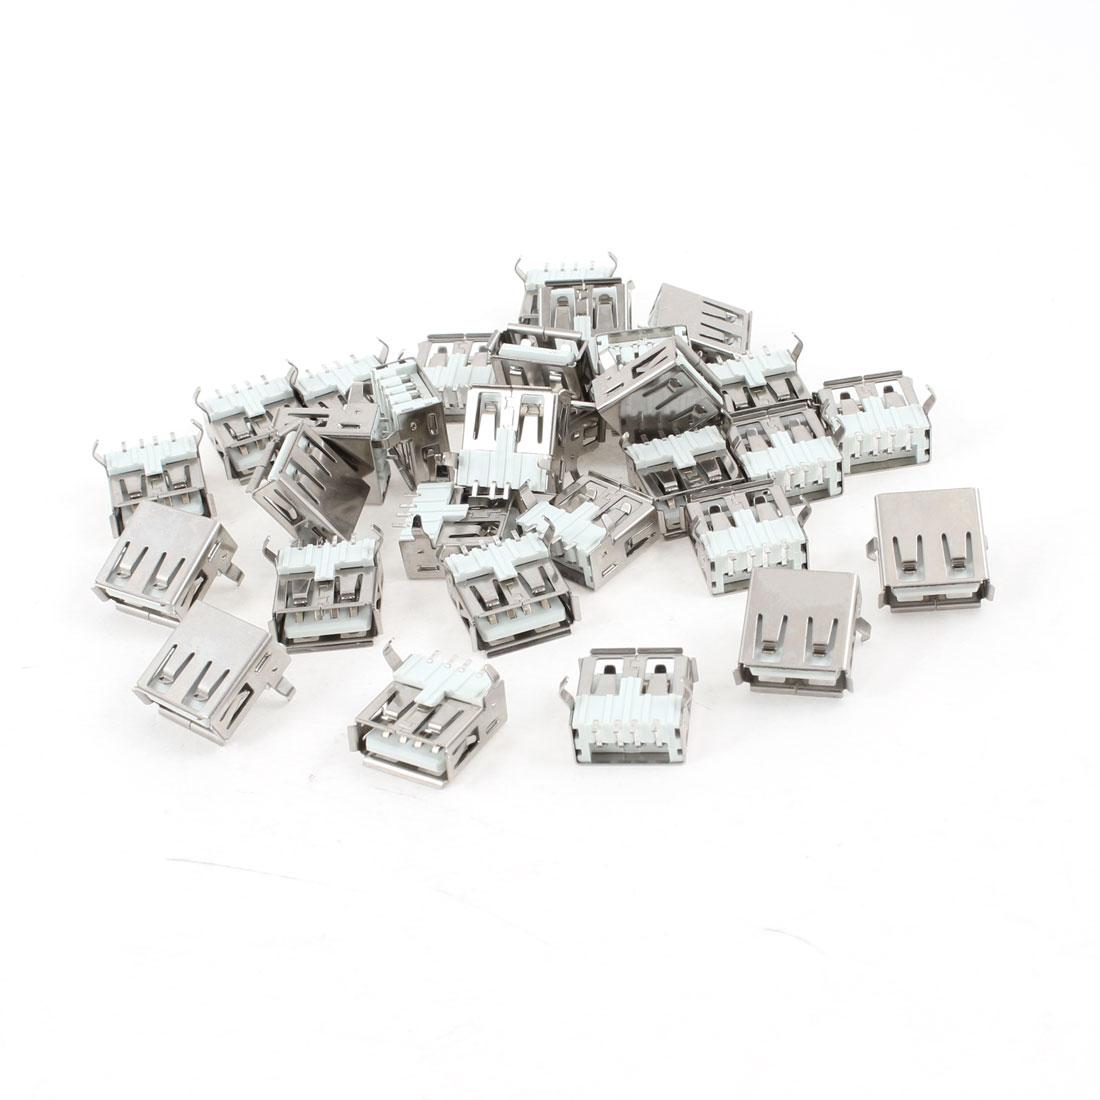 30 Pcs Single USB Type A Right Angle 4-Pin SMD Female Jack Socket